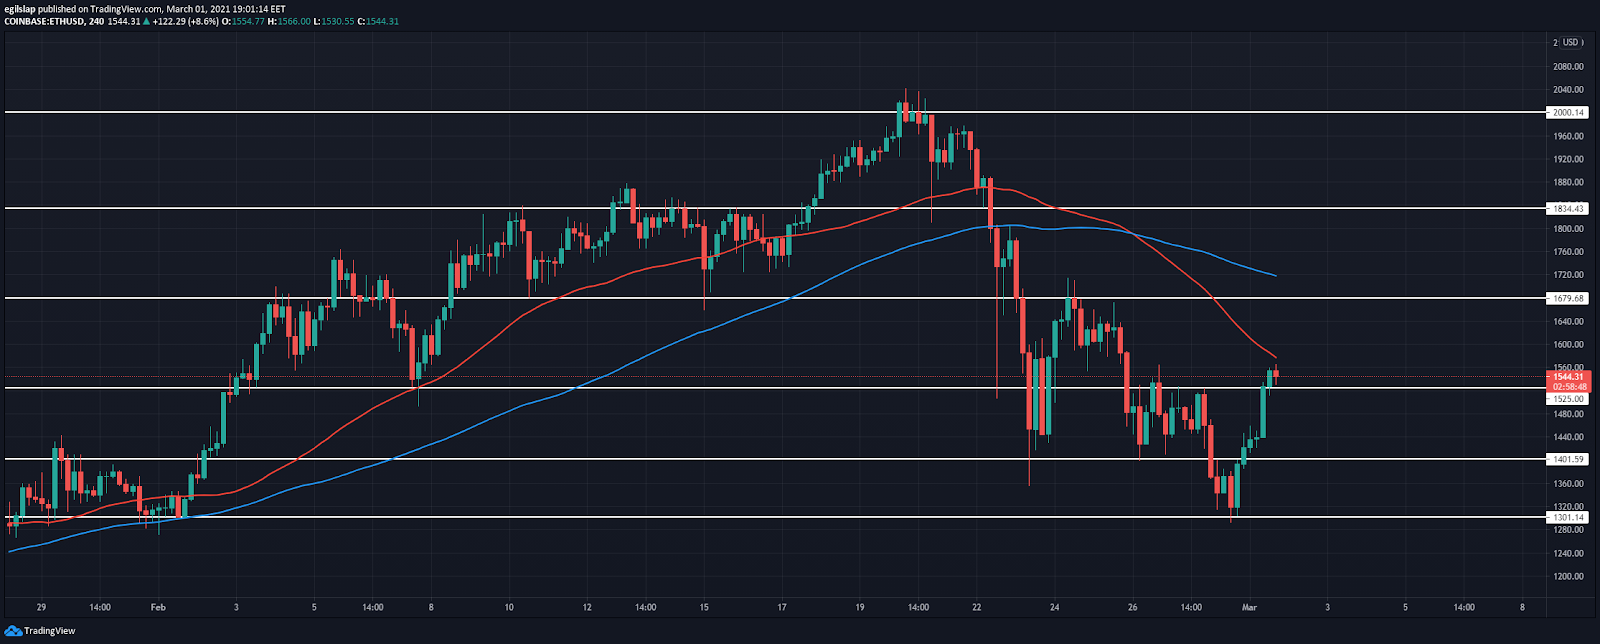 Weekly Crypto Price Analysis 1st Mar: BTC, ETH, DOT, UNI, SUSHI 3